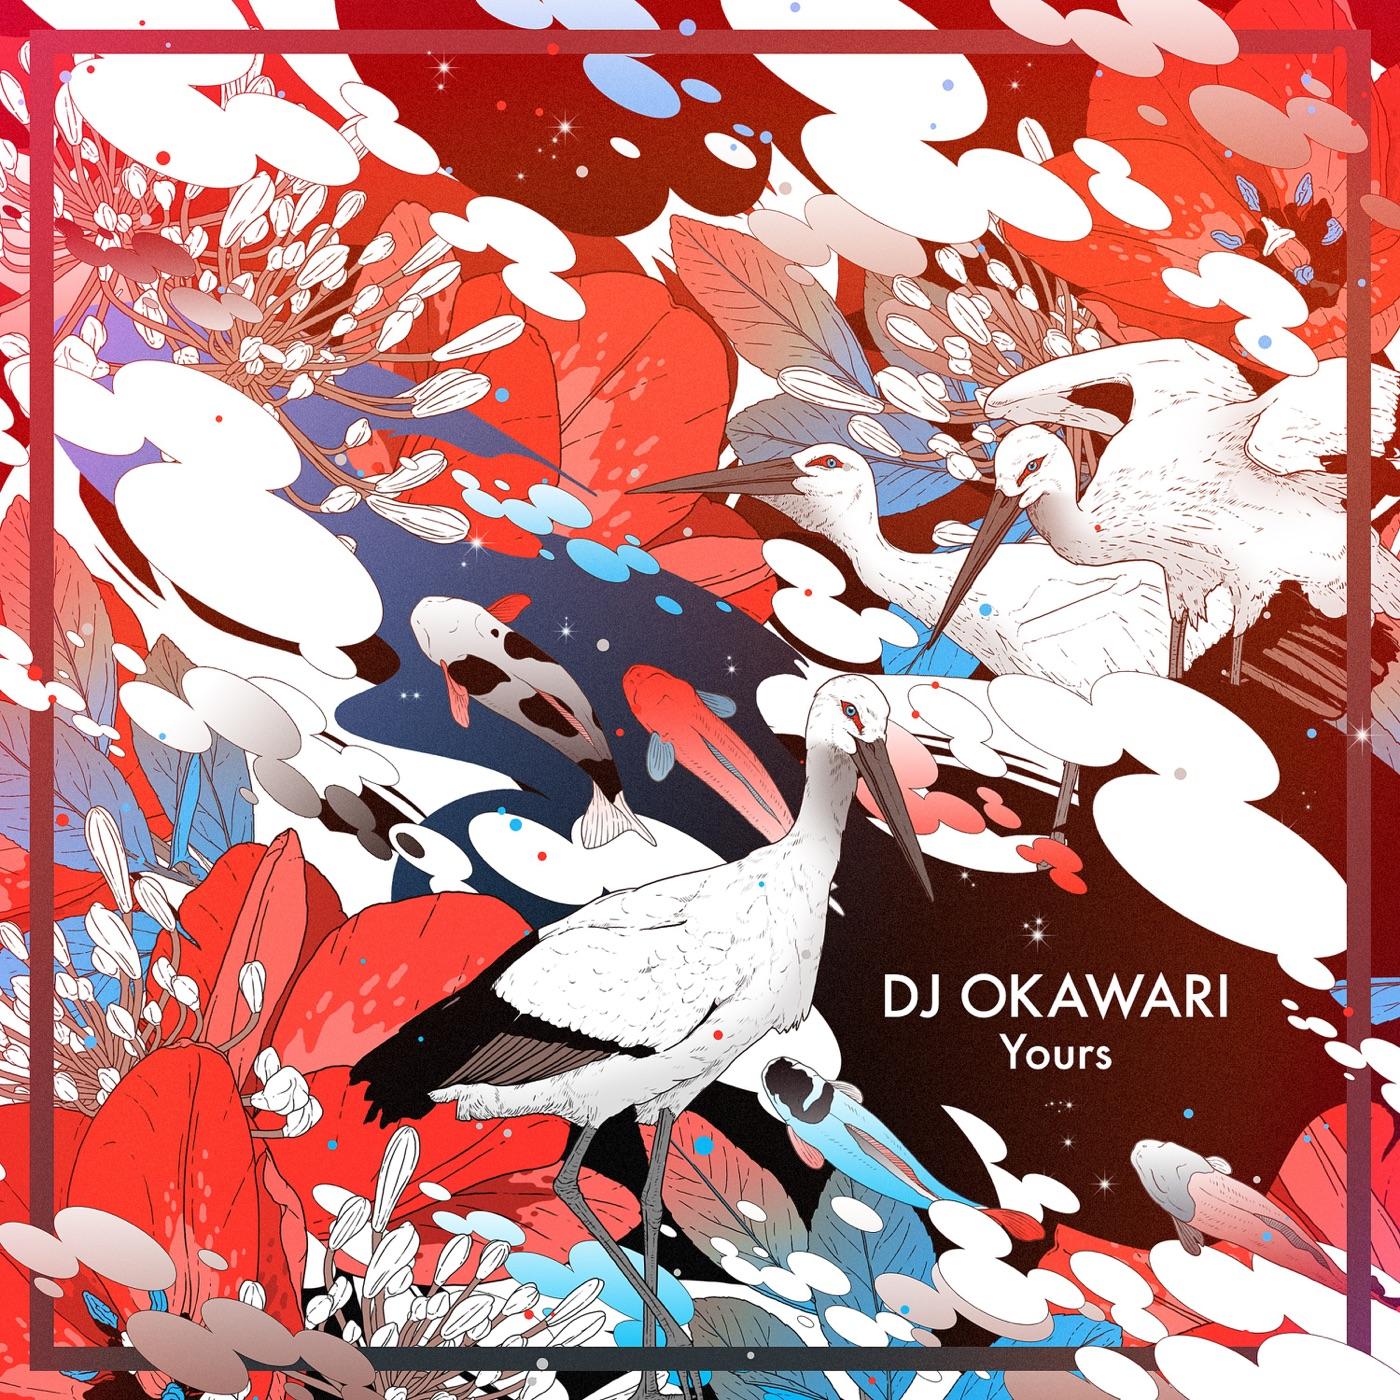 DJ OKAWARI - Yours - Single